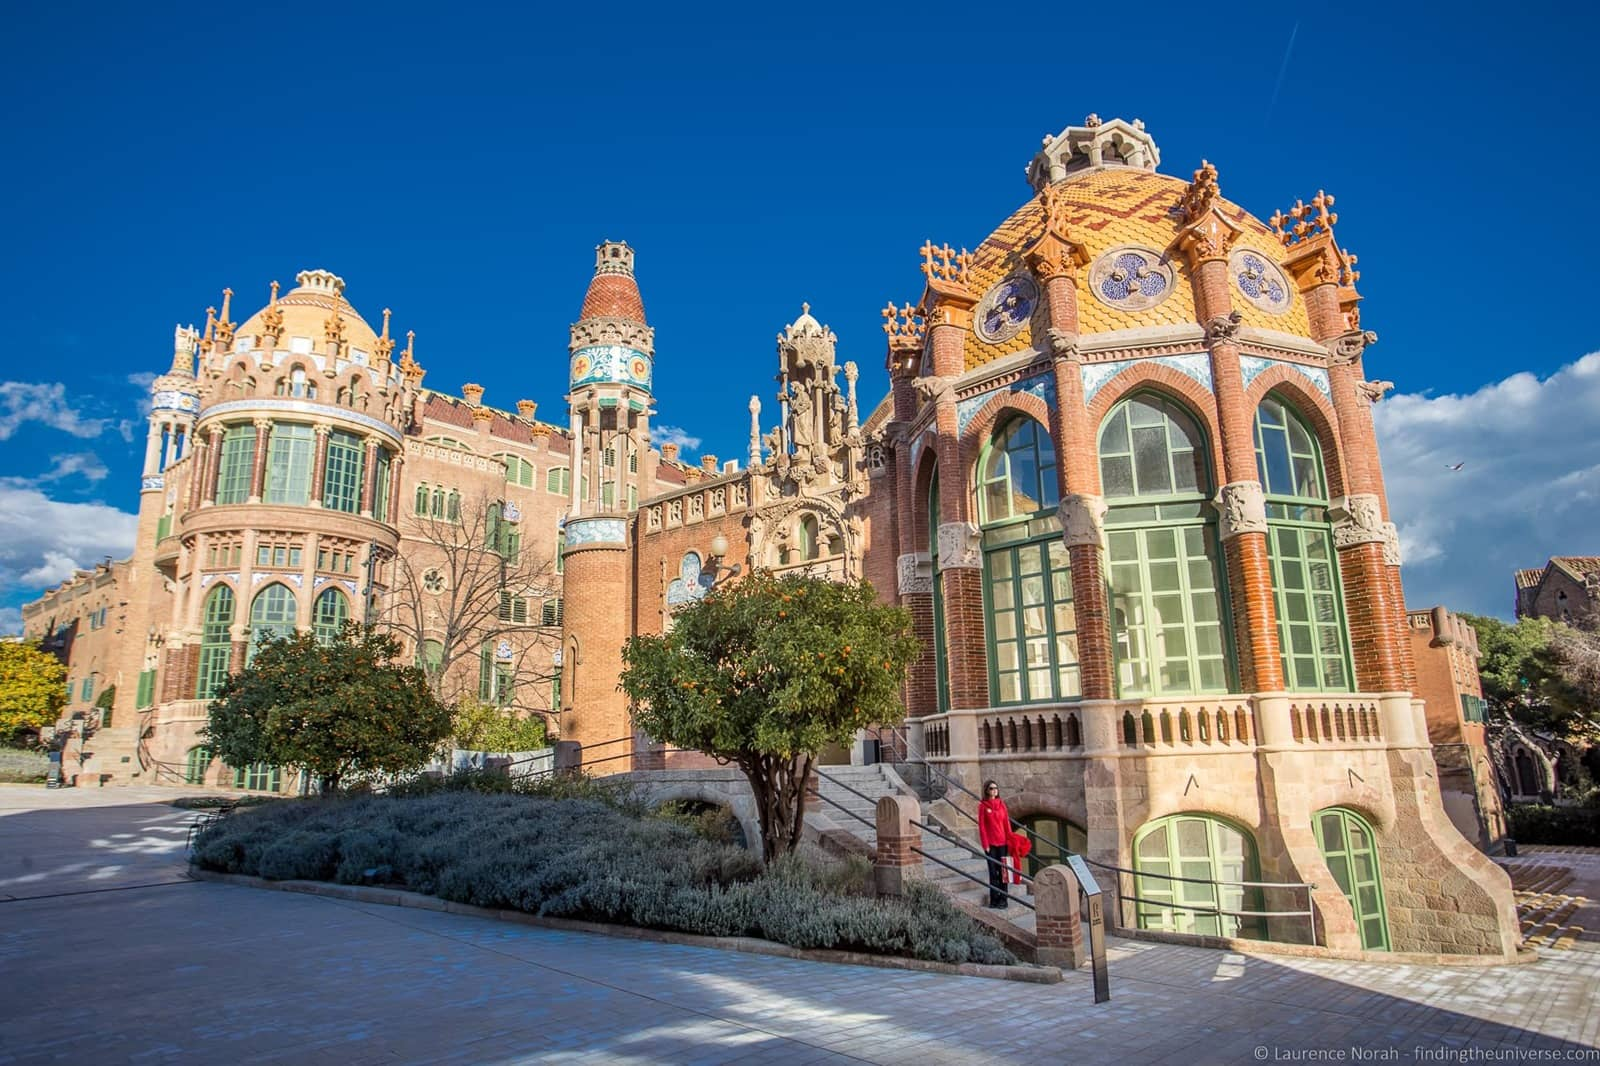 [Recinte+Modernista+Sant+Pau+Barcelona_by_Laurence+Norah-2%5B4%5D]